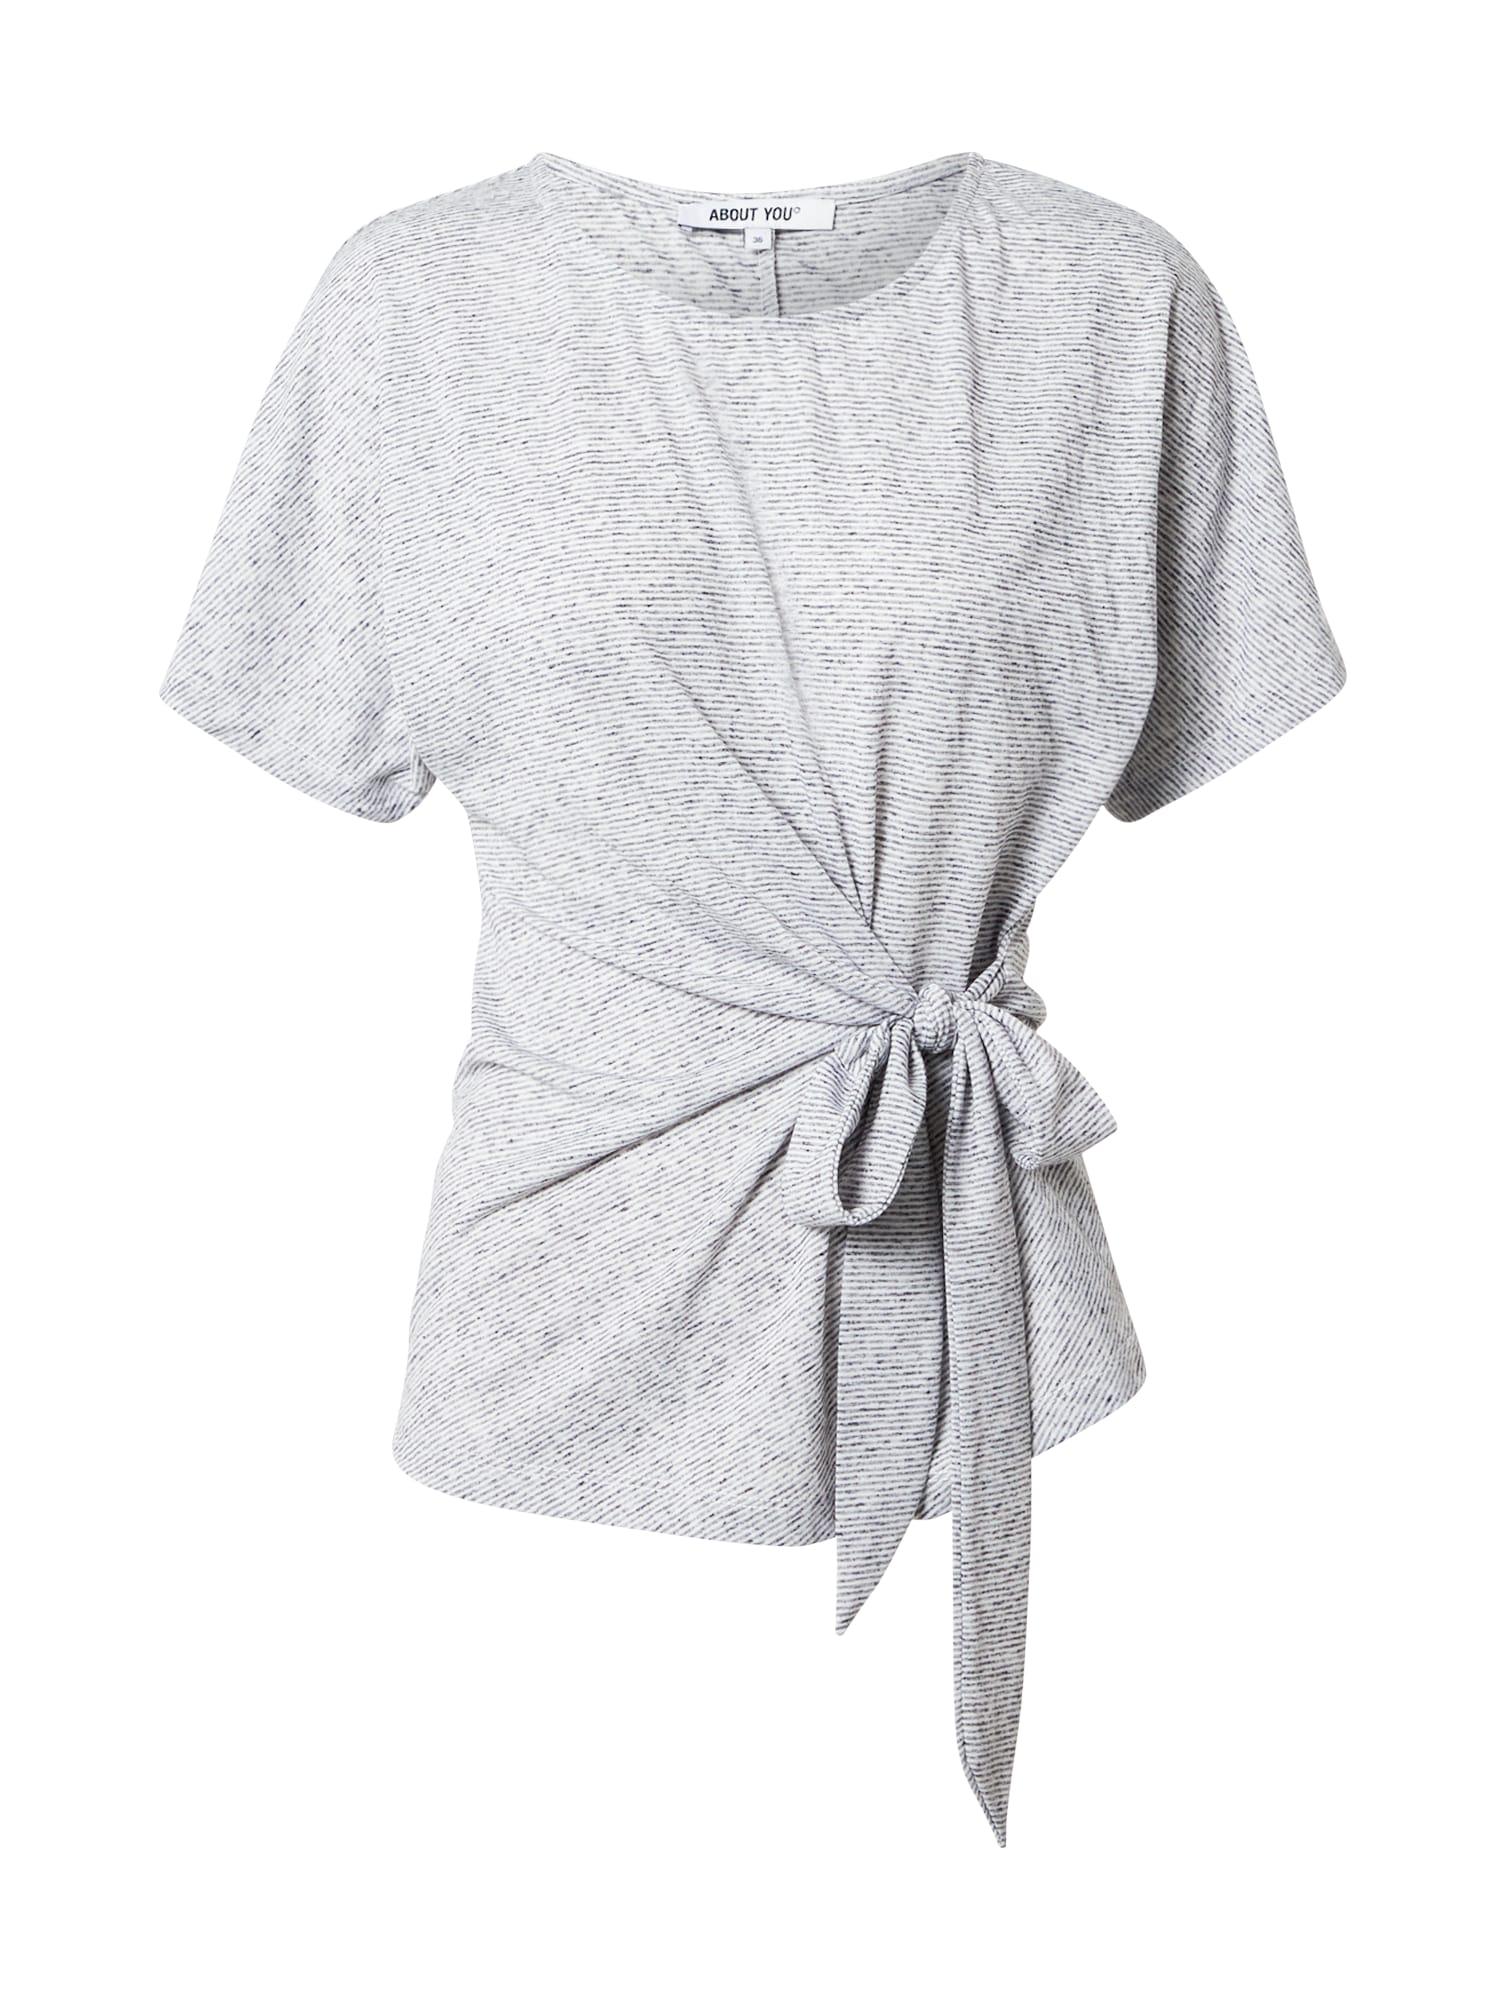 ABOUT YOU Marškinėliai 'Faline' pilka / balta